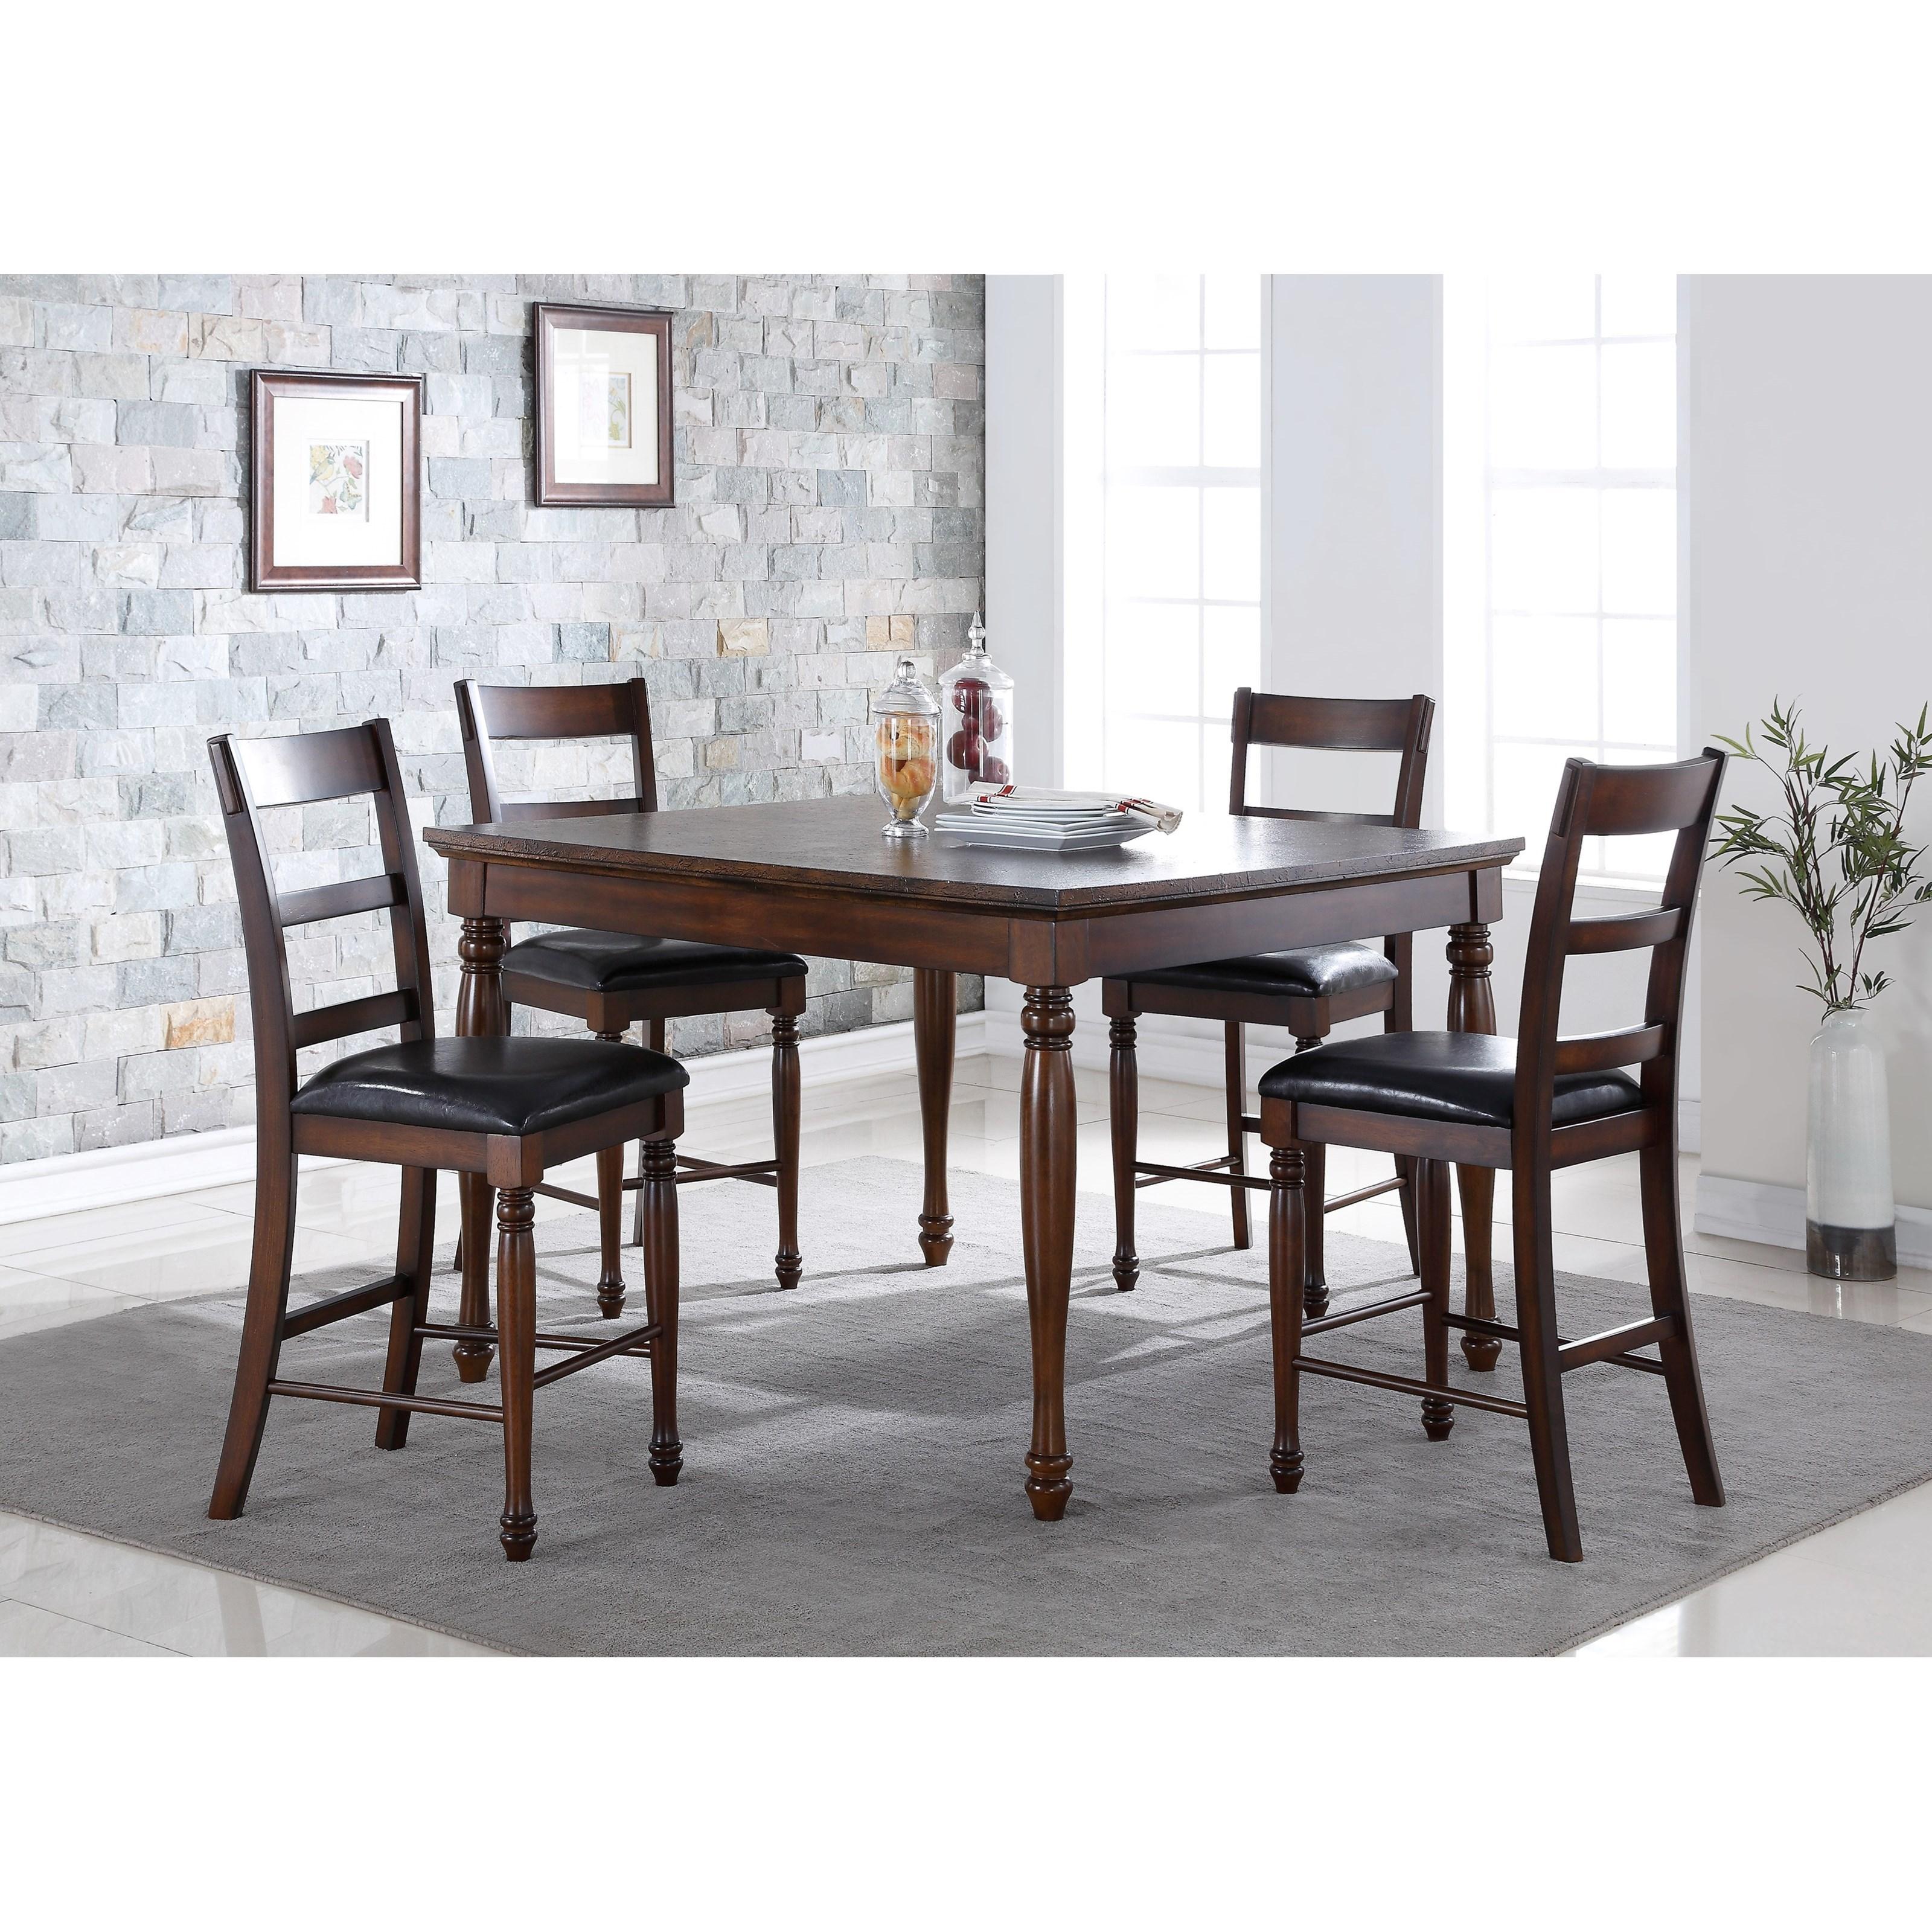 Legends Furniture Breckenridge 5 Piece Counter Height Table & Stool Set - Item Number: ZBRG-8000D